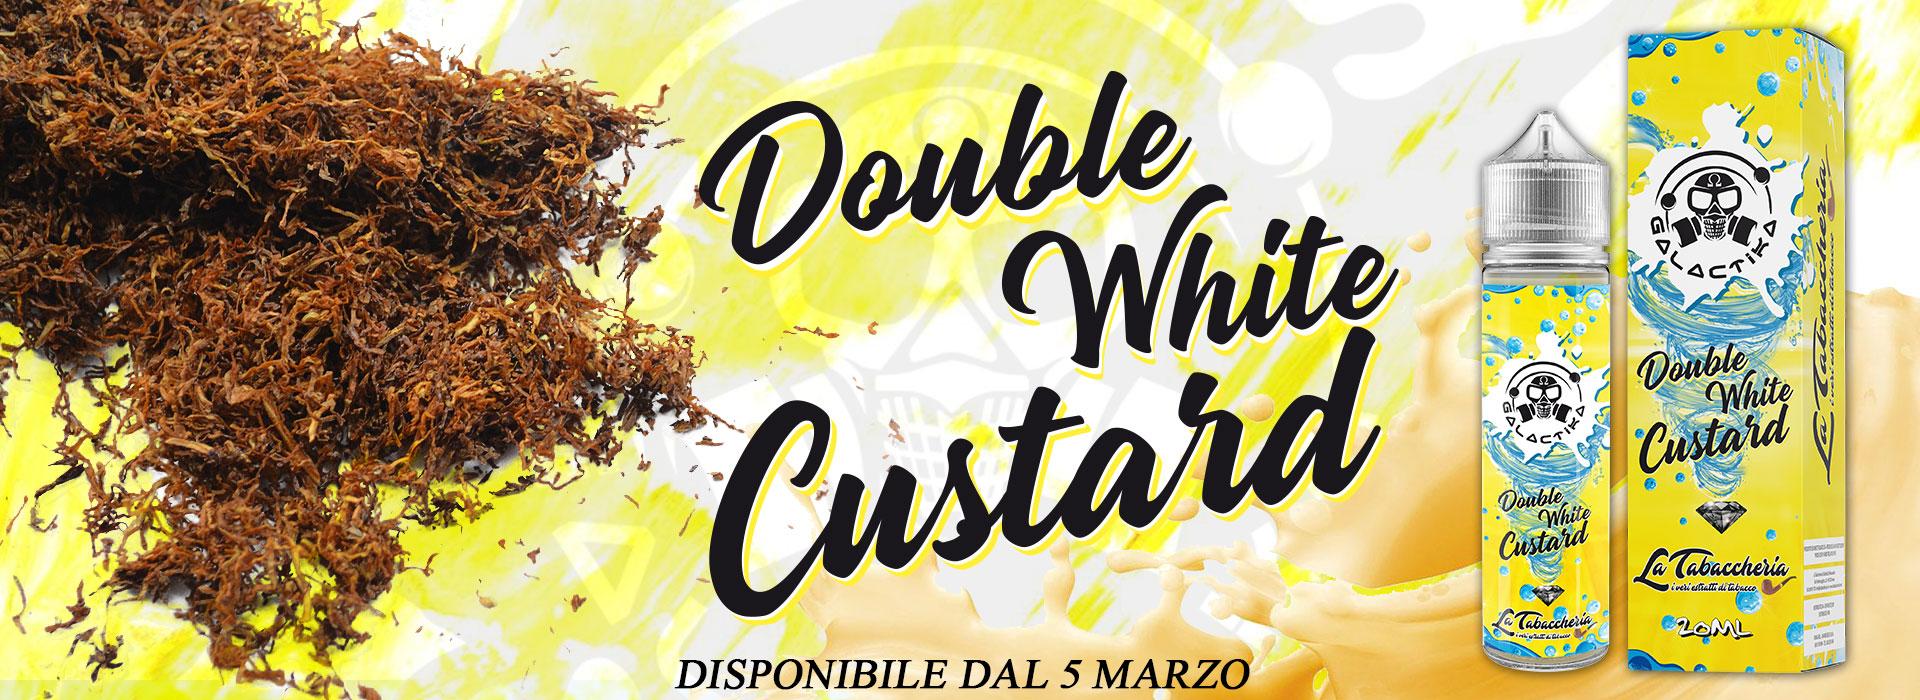 Double White Custard